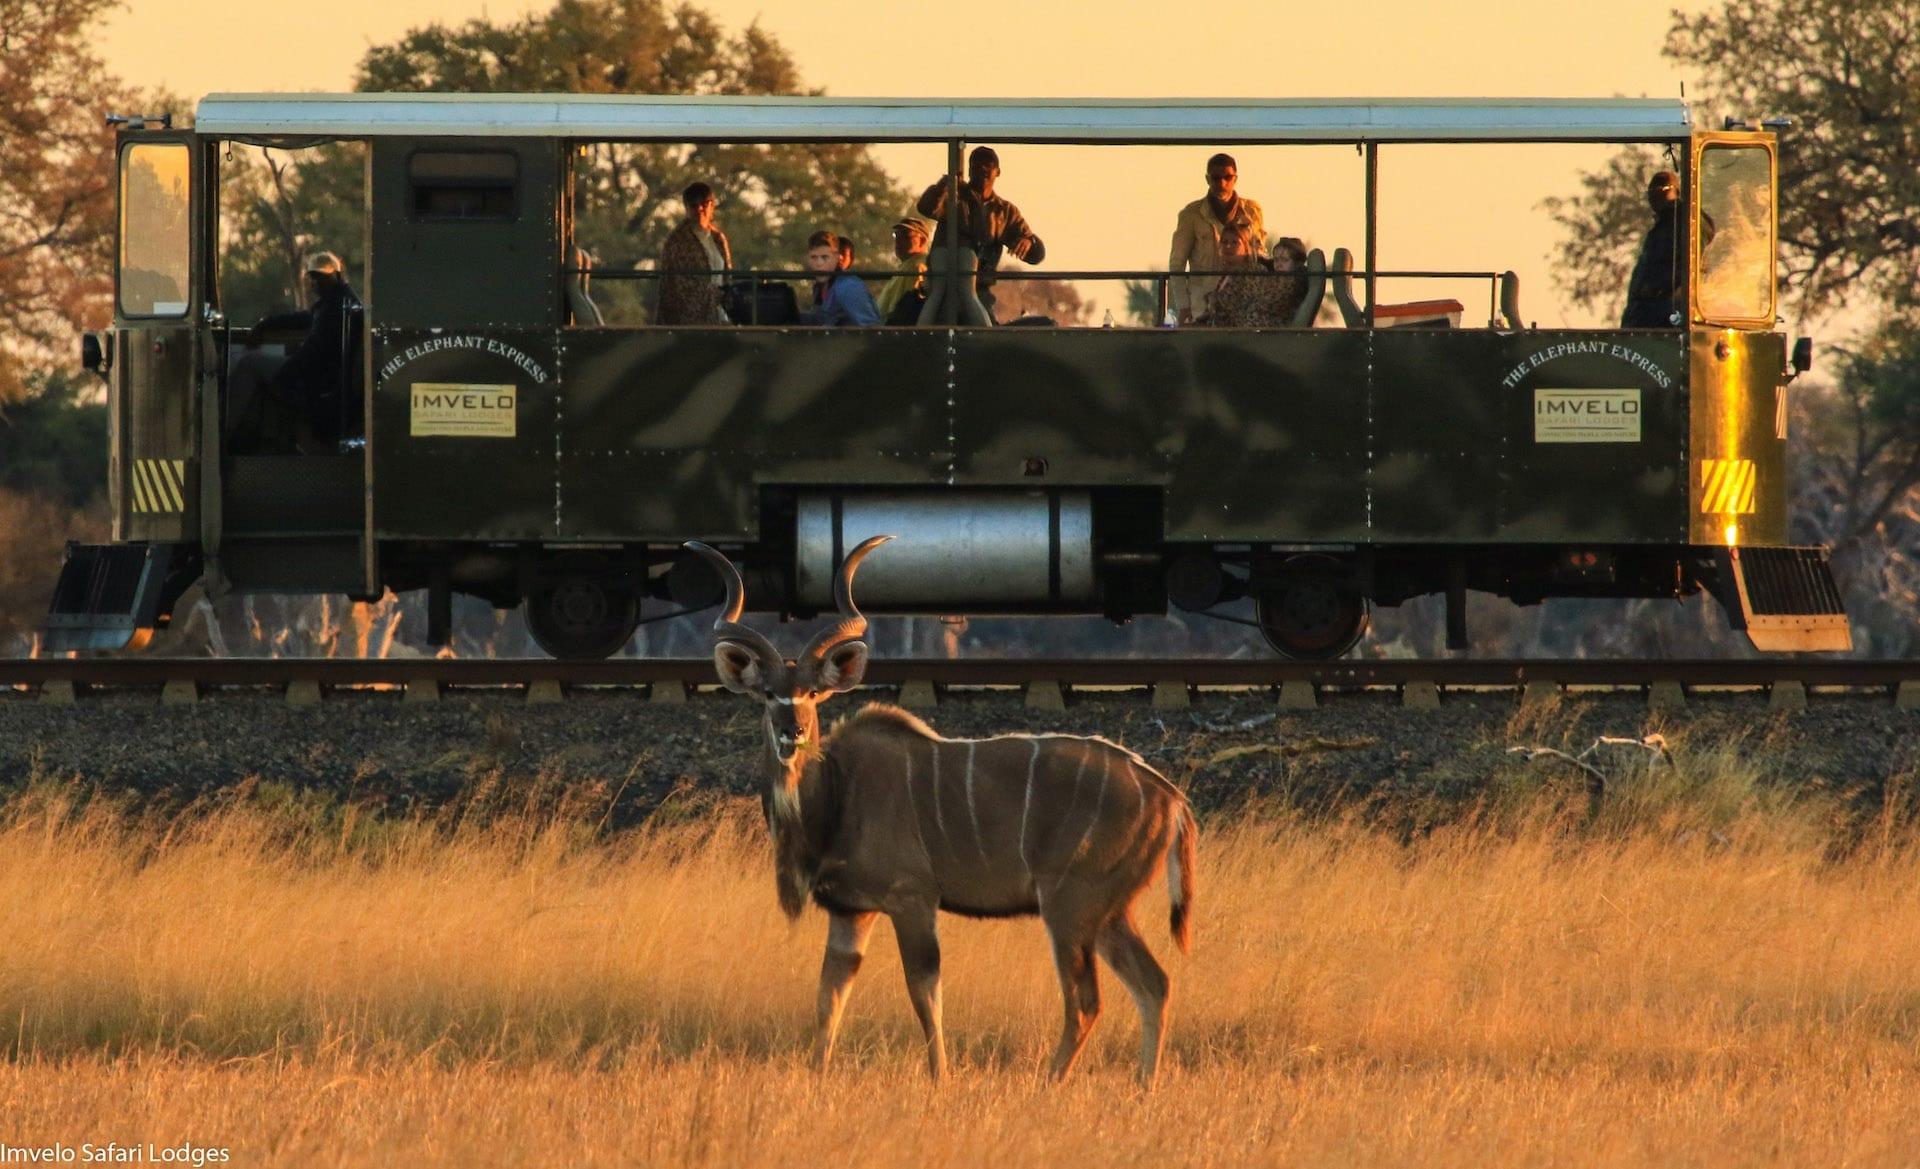 # FOTO 2 - Elephant Express - 9